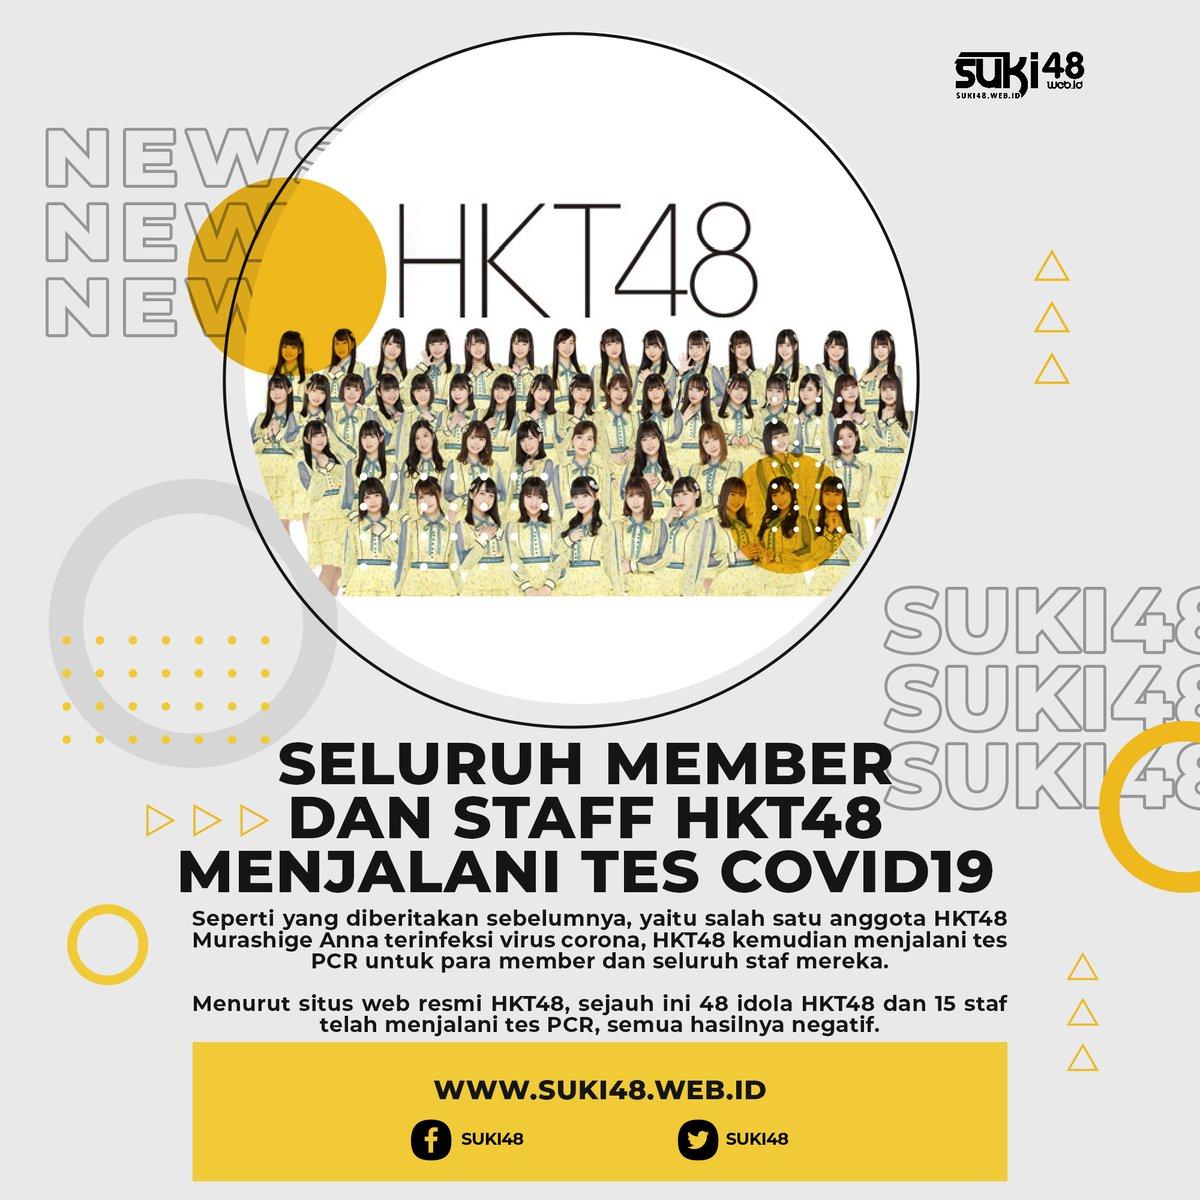 Jadi hitungan 48 member yang menjalani tes karena ada 52 idola berada di bawah HKT48: 49 idola aktif + 2 idola (Miyawaki Sakura dan Yabuki Nako) di IZ * ONE + 1 idola (Kudo Haruka) meninggalkan grup pada bulan Oktober.  #suki48 #update48 #HKT48 #COVID19 https://t.co/3N3TwxFftm